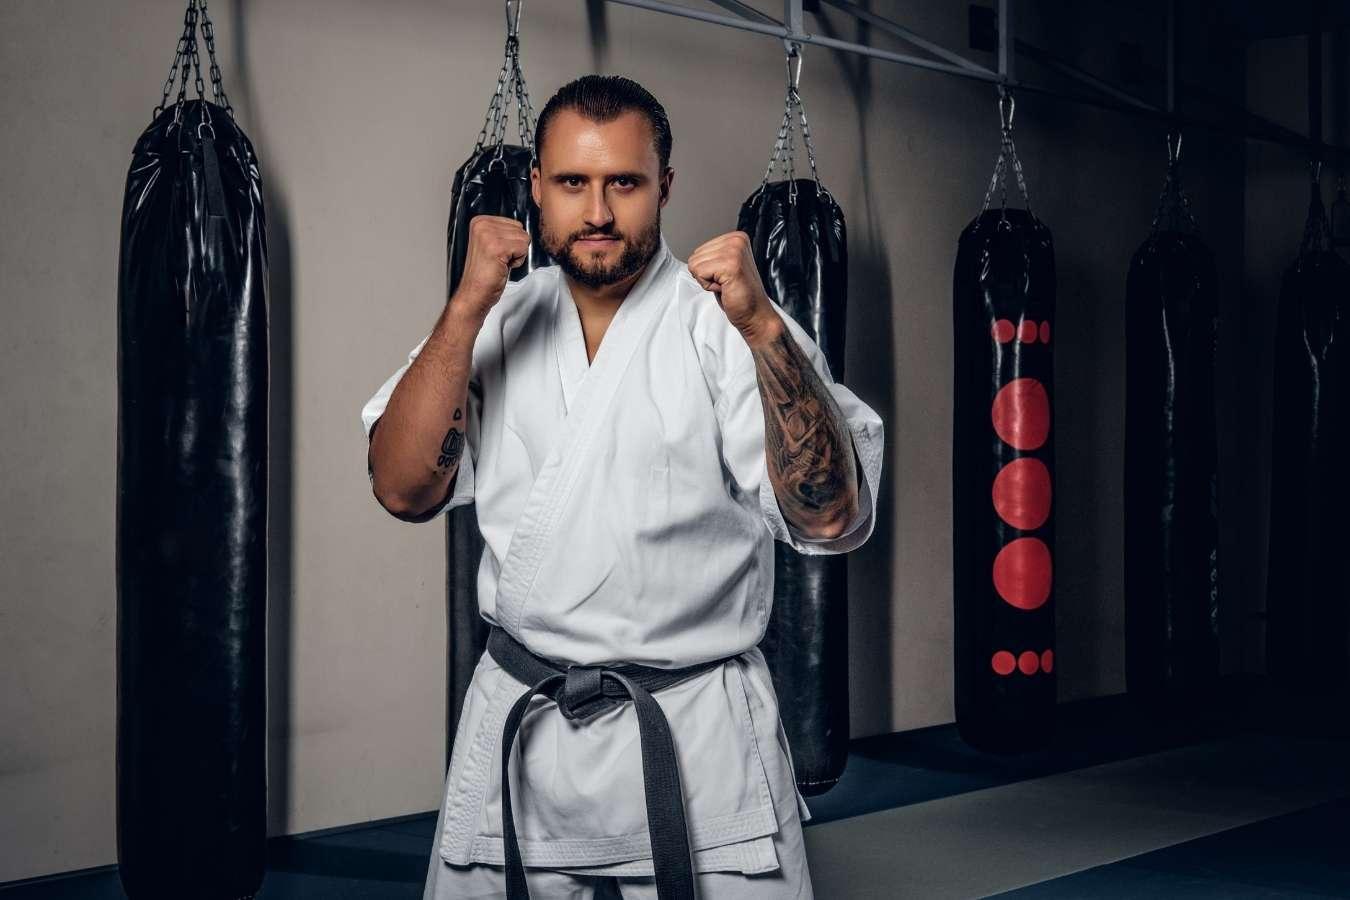 Karate strength